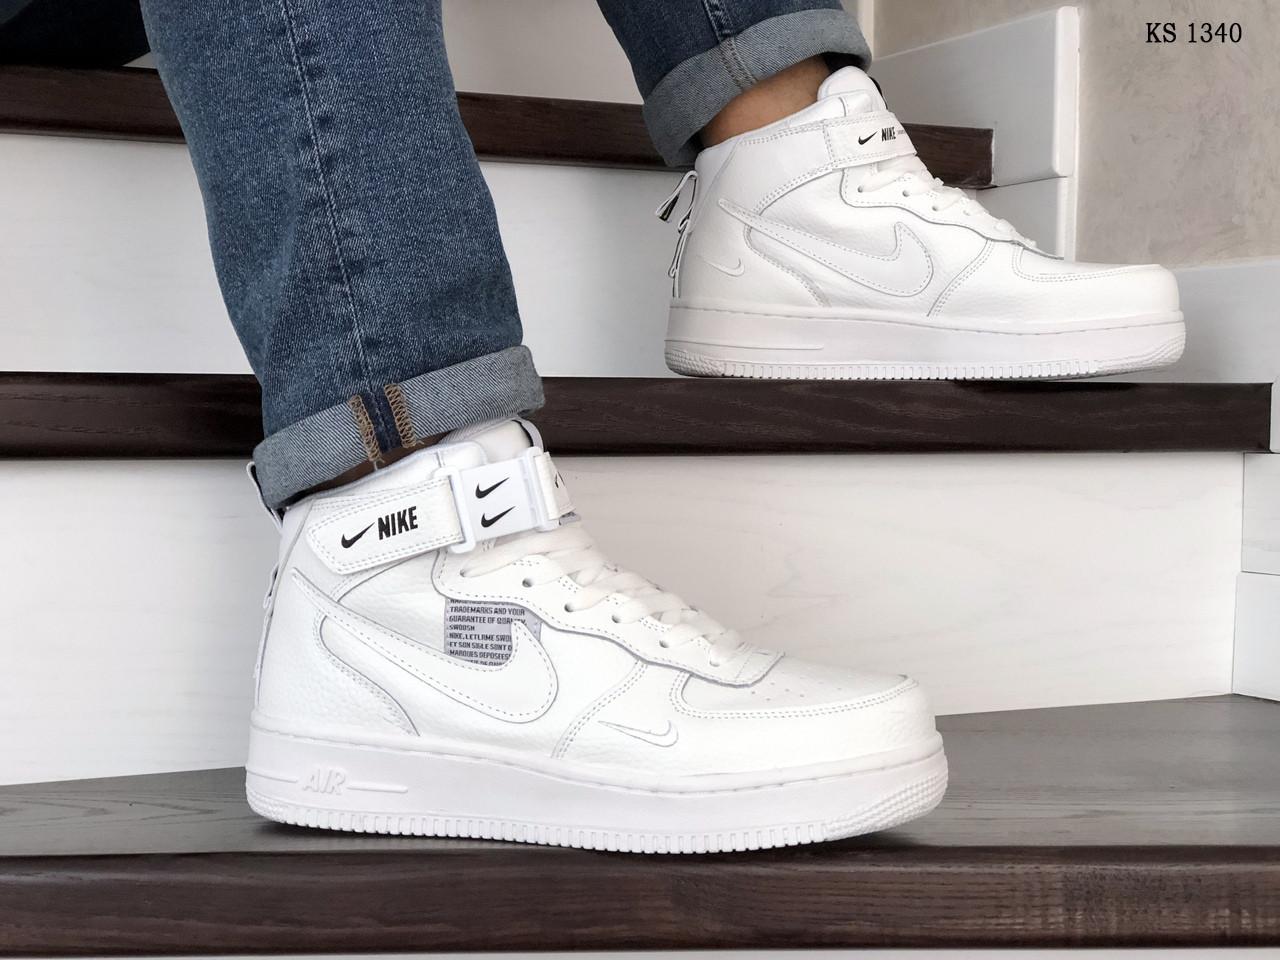 Мужские зимние кроссовки Nike Air Force 1 07 Mid LV8 (белые)